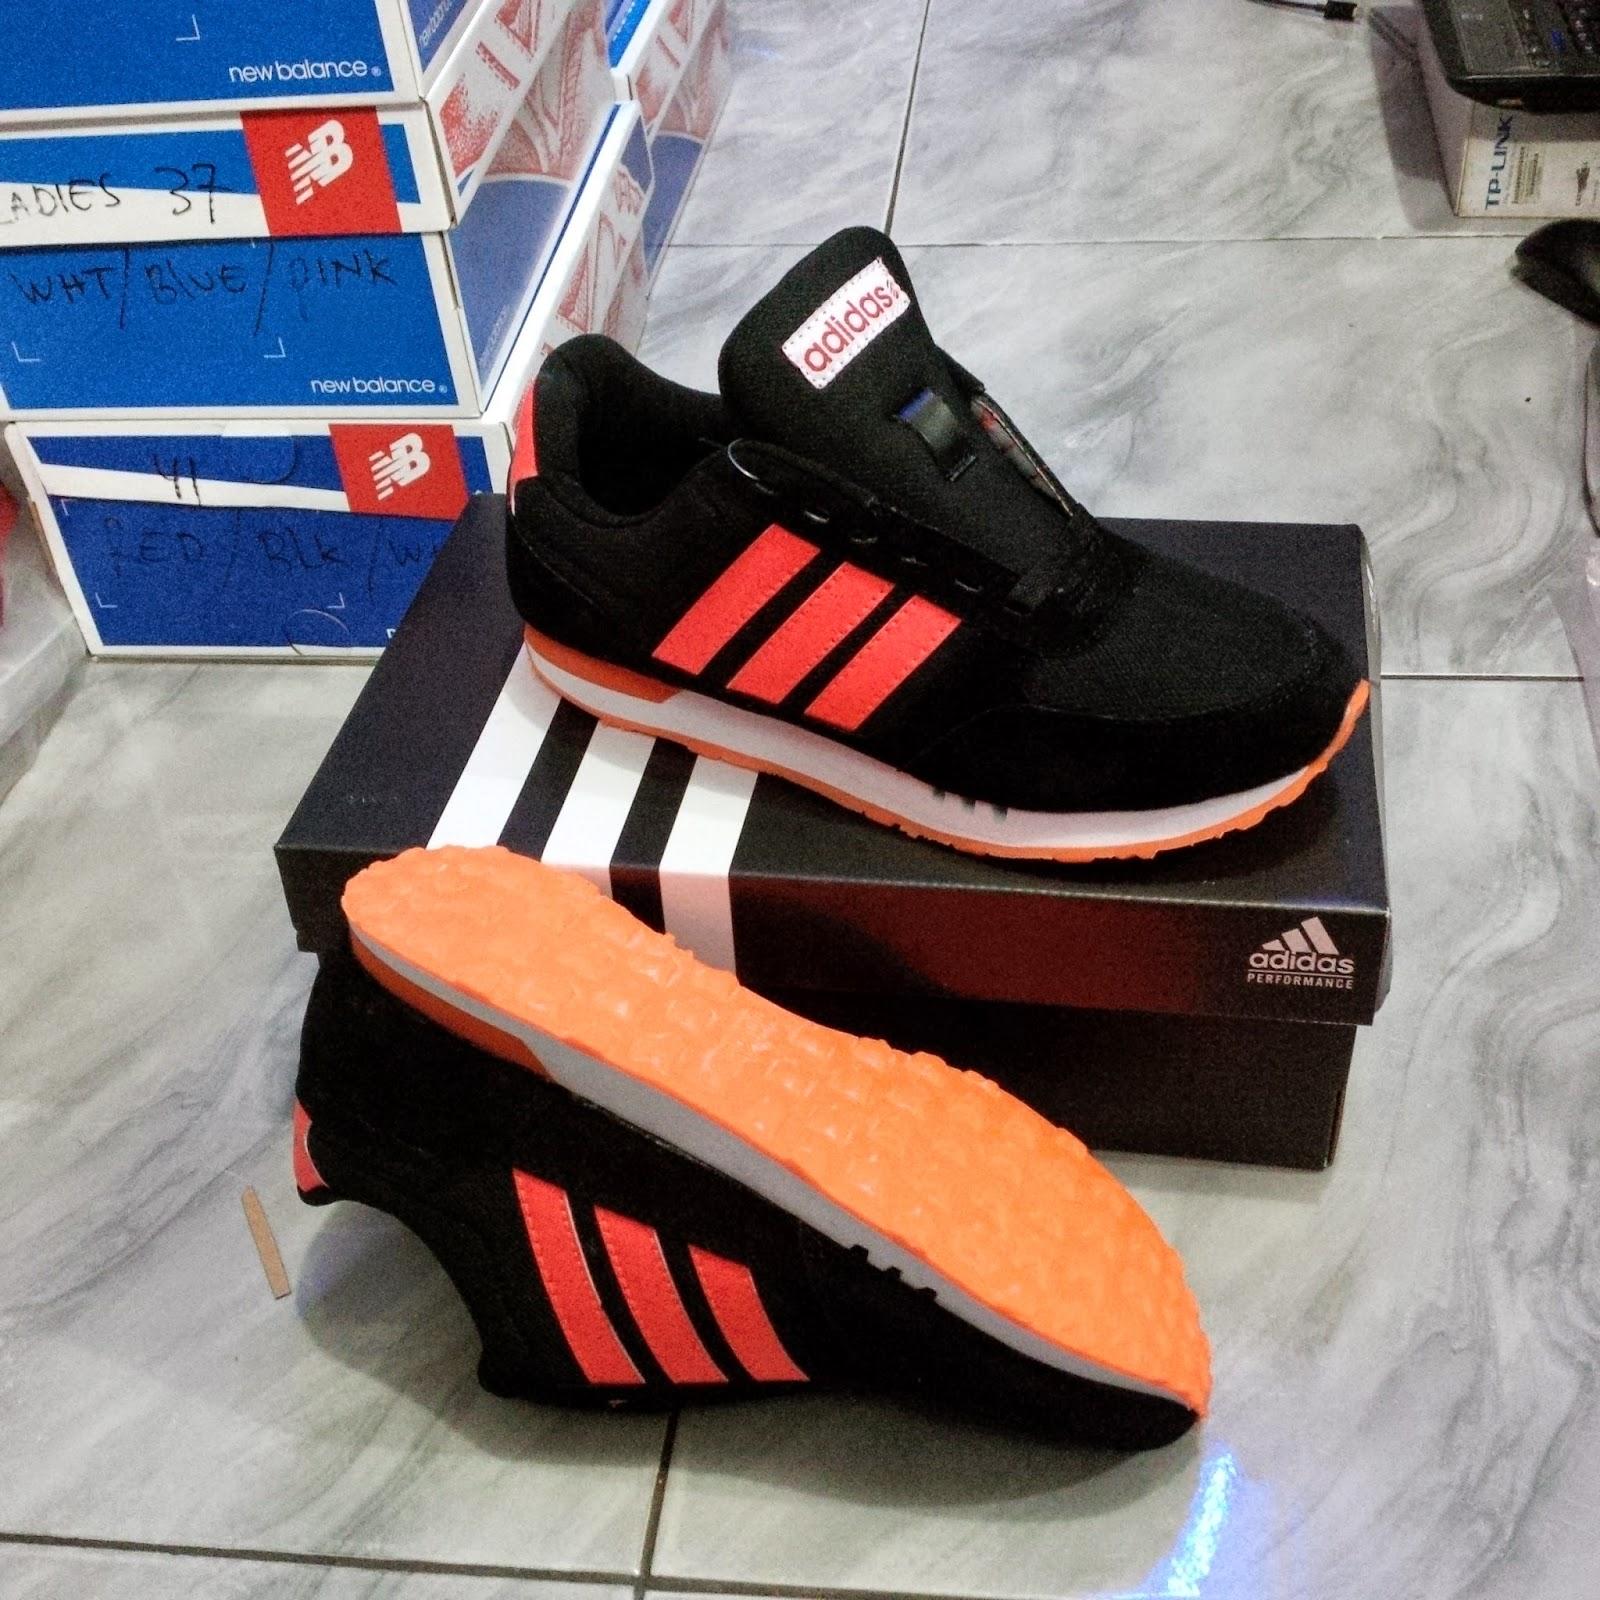 ... clearance sepatu adidas neo grade original 99 mirip original asli  banyak pilihan motif dan warna harga b21bbbf542